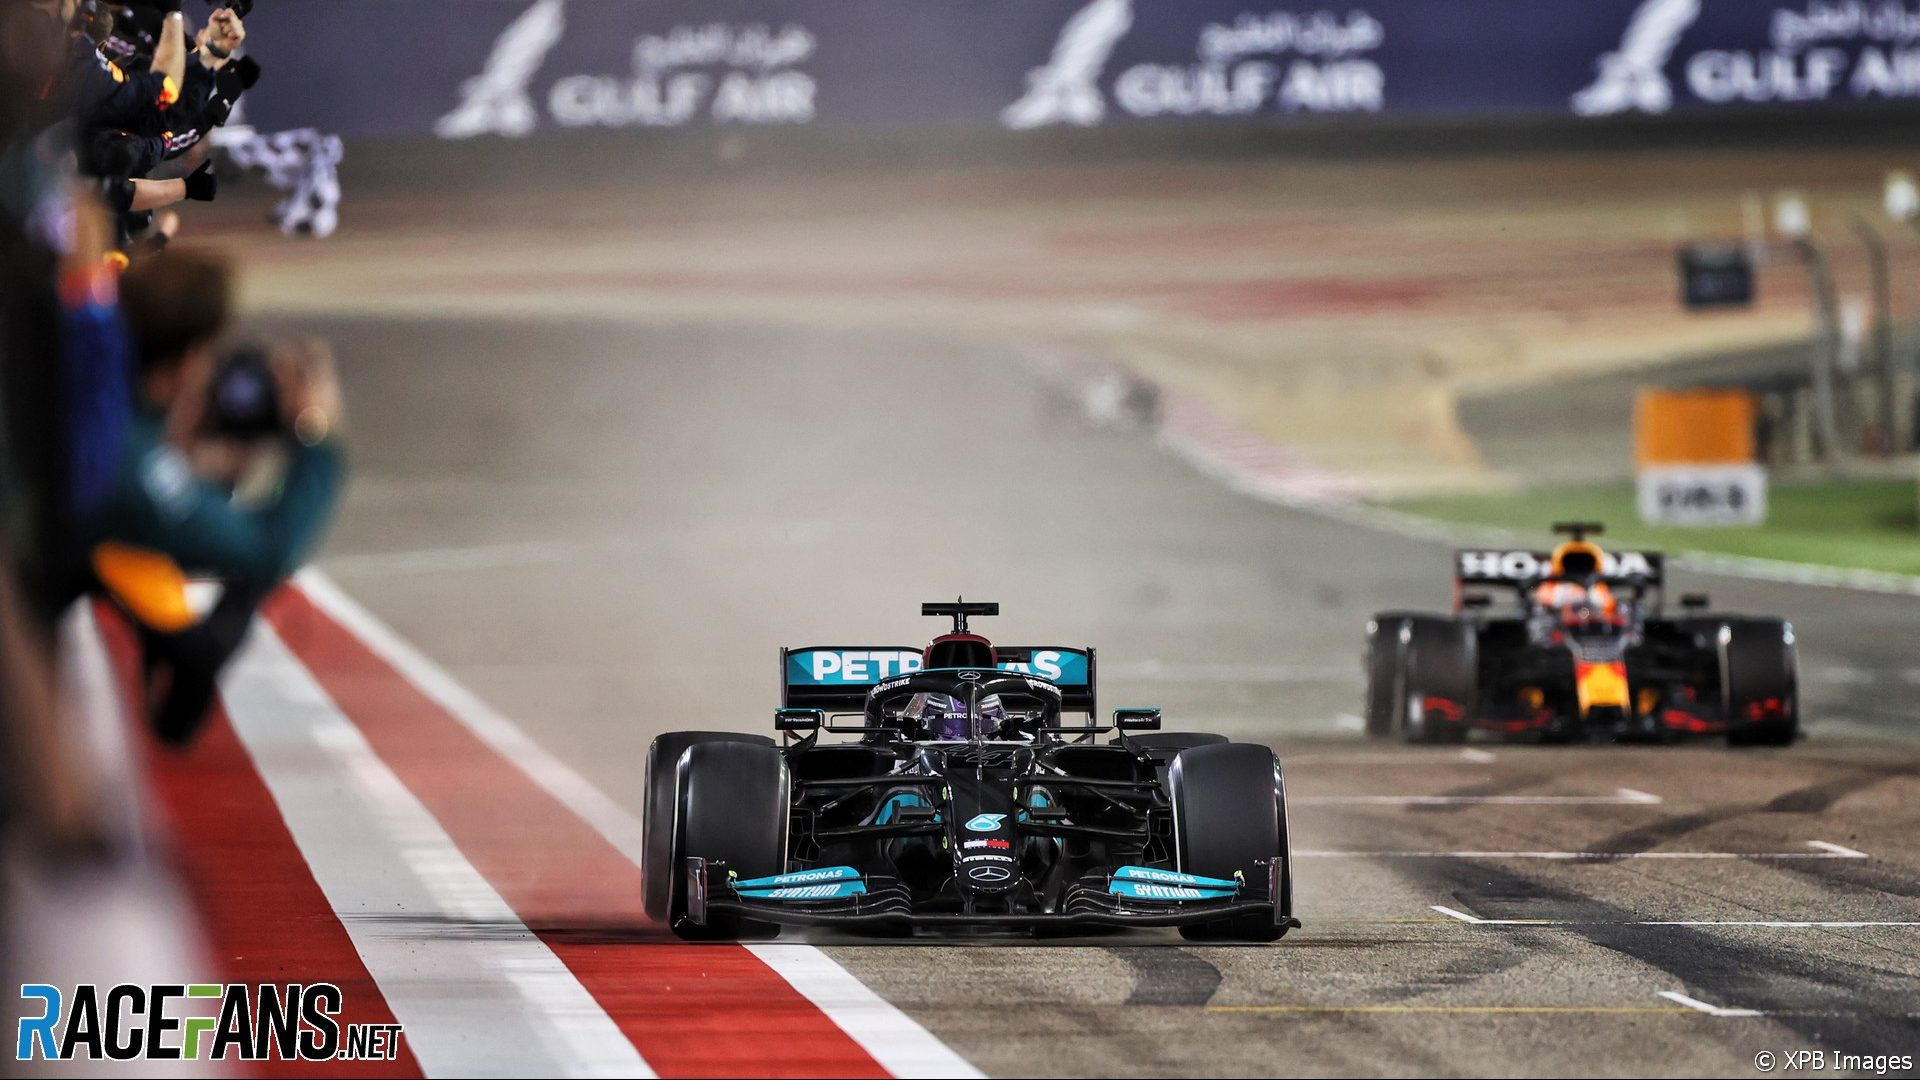 Lewis Hamilton, Max Verstappen, Bahrain International Circuit, 2021